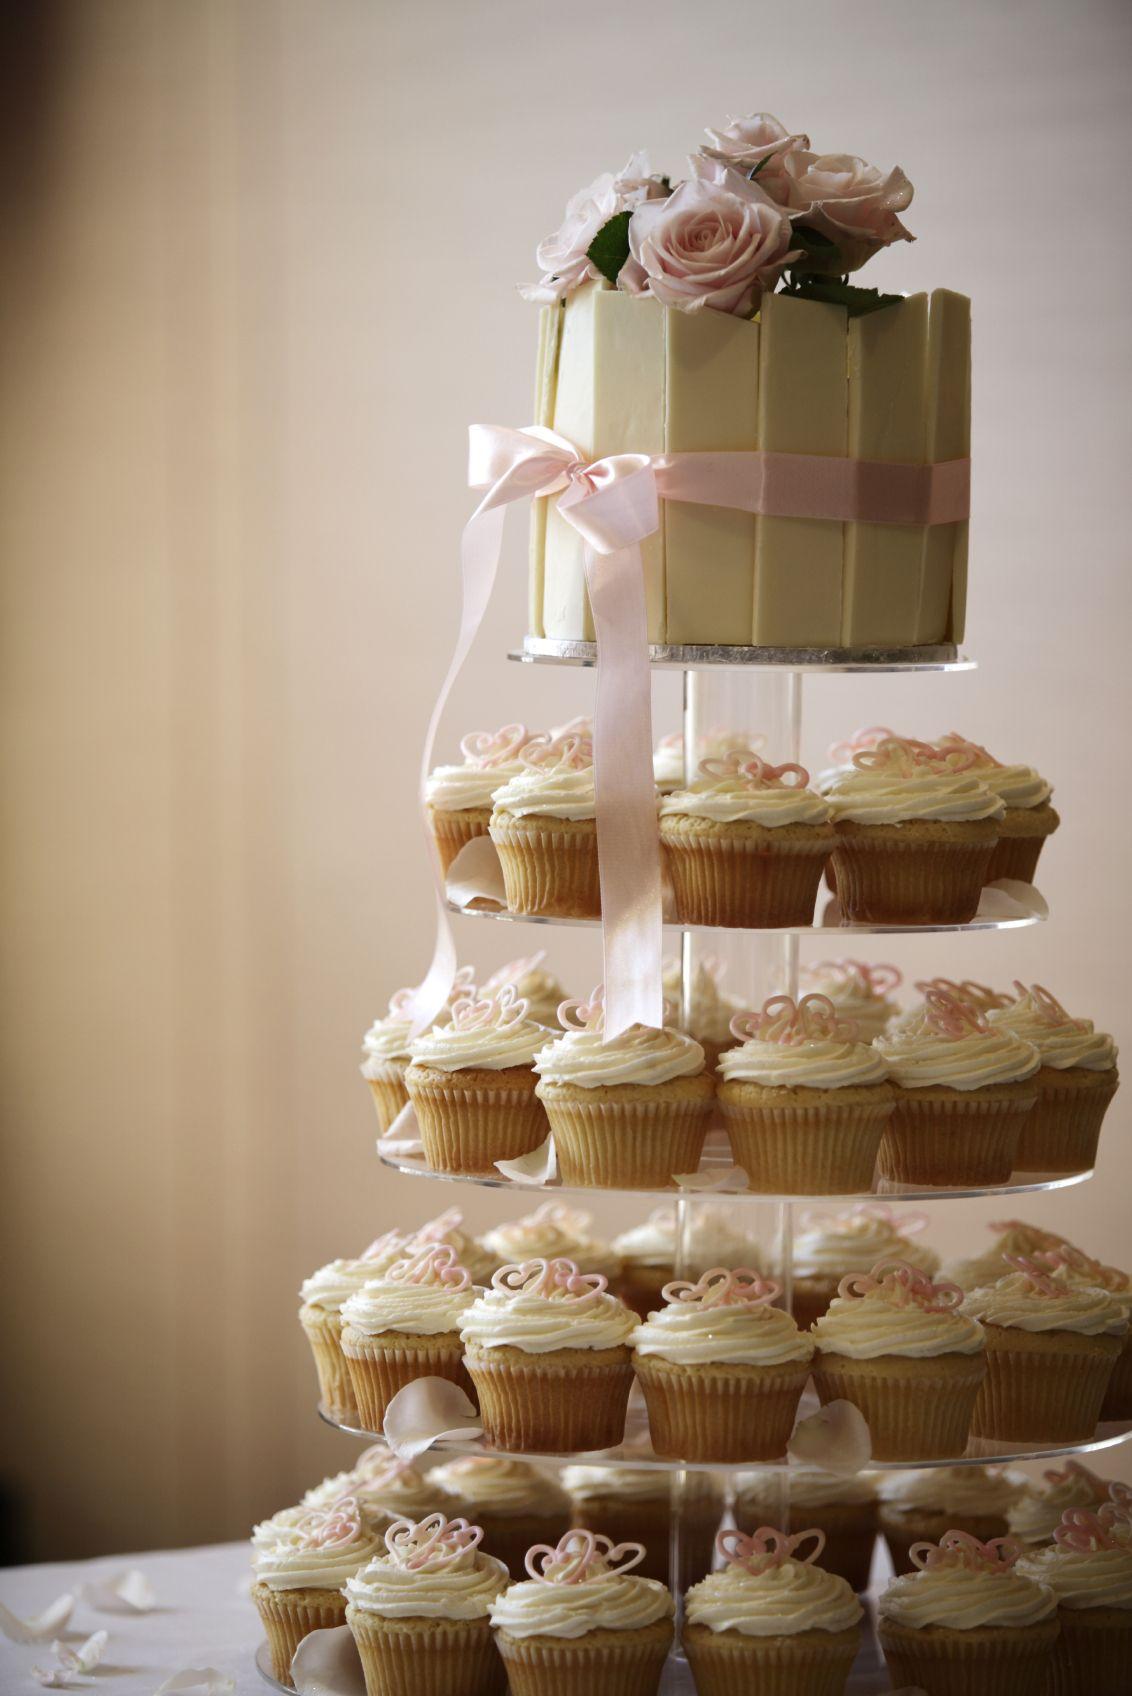 Wedding Cupcake Tower Weddings